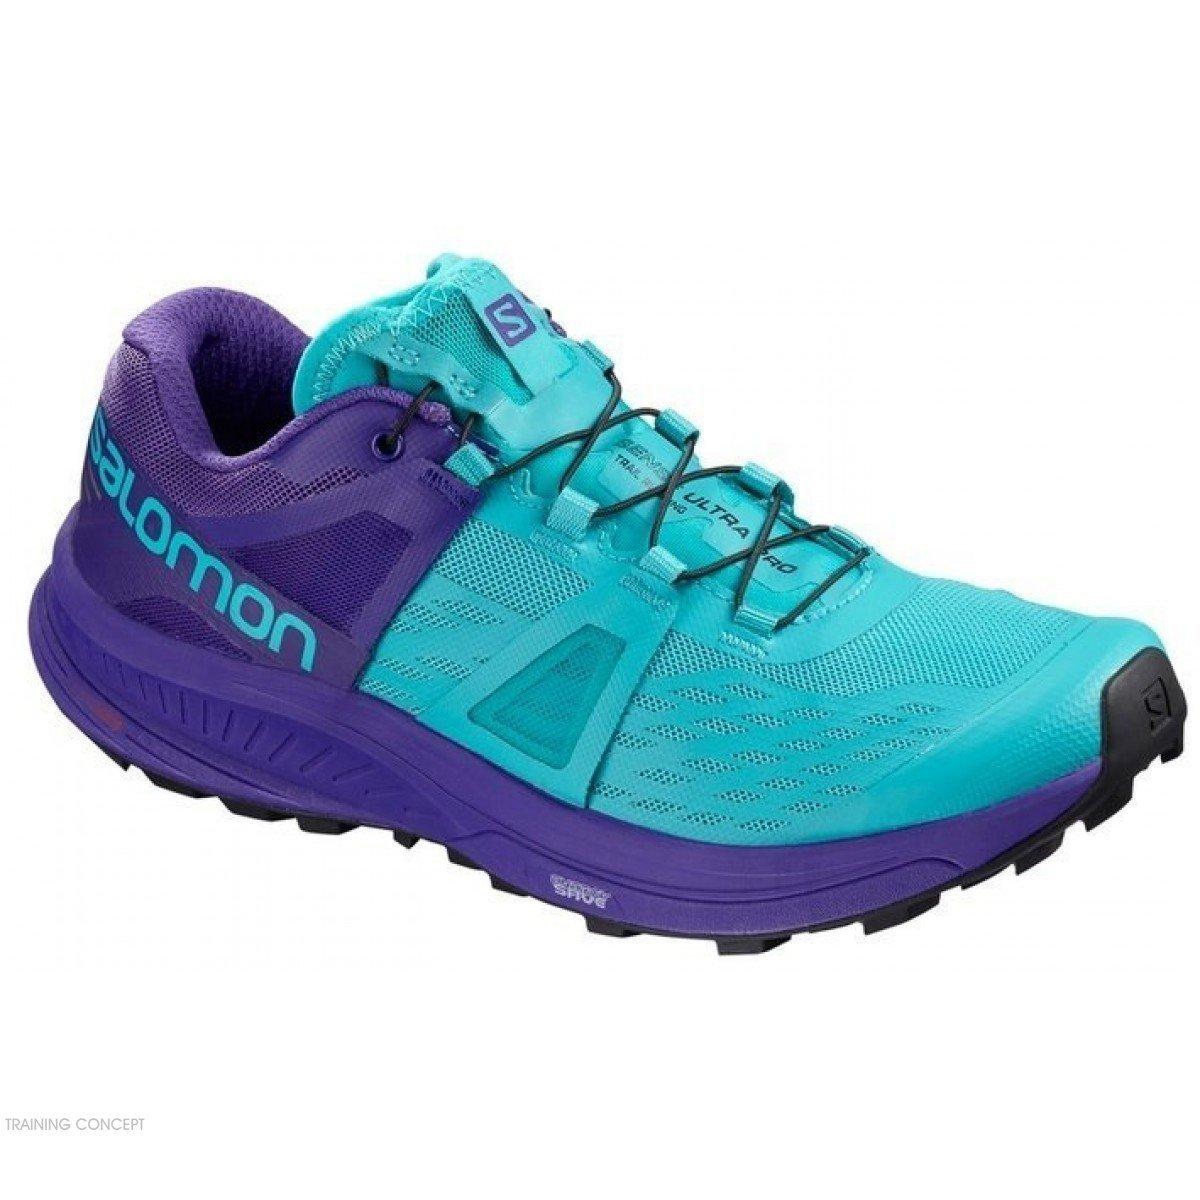 Blue Running Femmes Pour Pro Ultra Chaussure 404948 Trail De Salomon FJc1lK